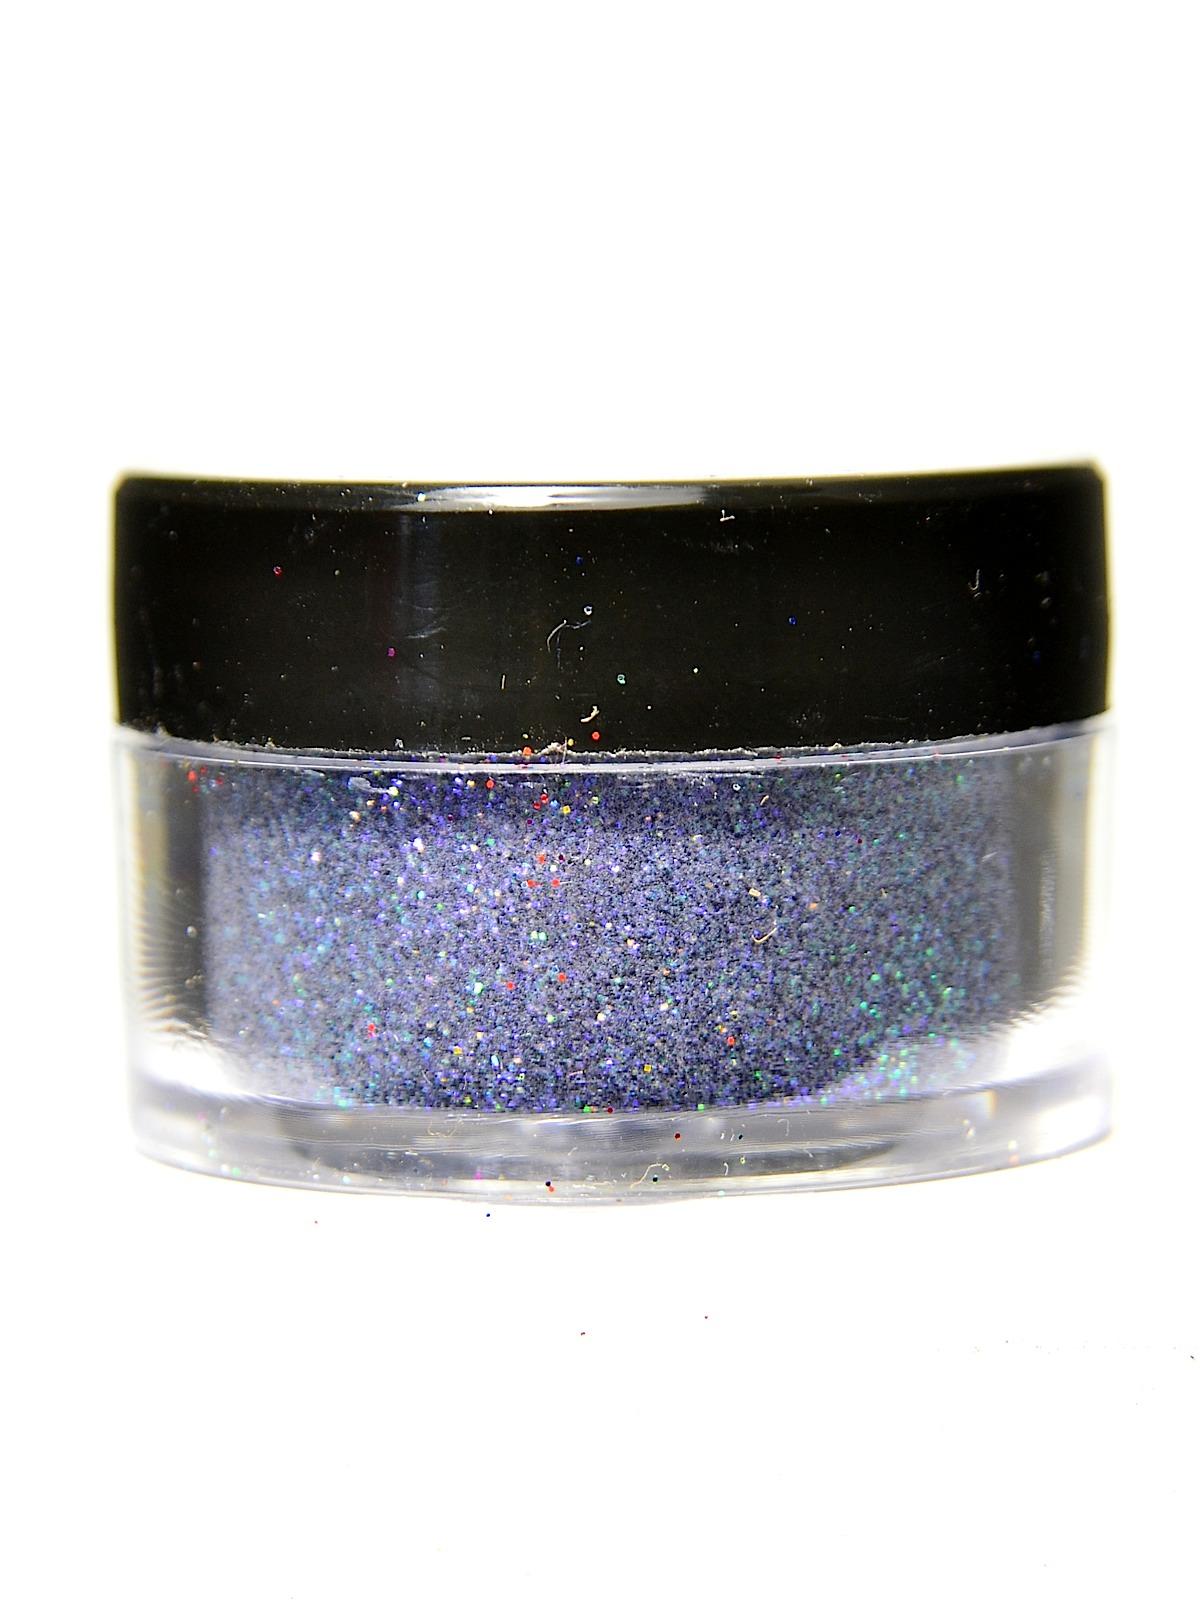 Ultrafine Transparent Glitter Calypso 1 2 Oz. Jar